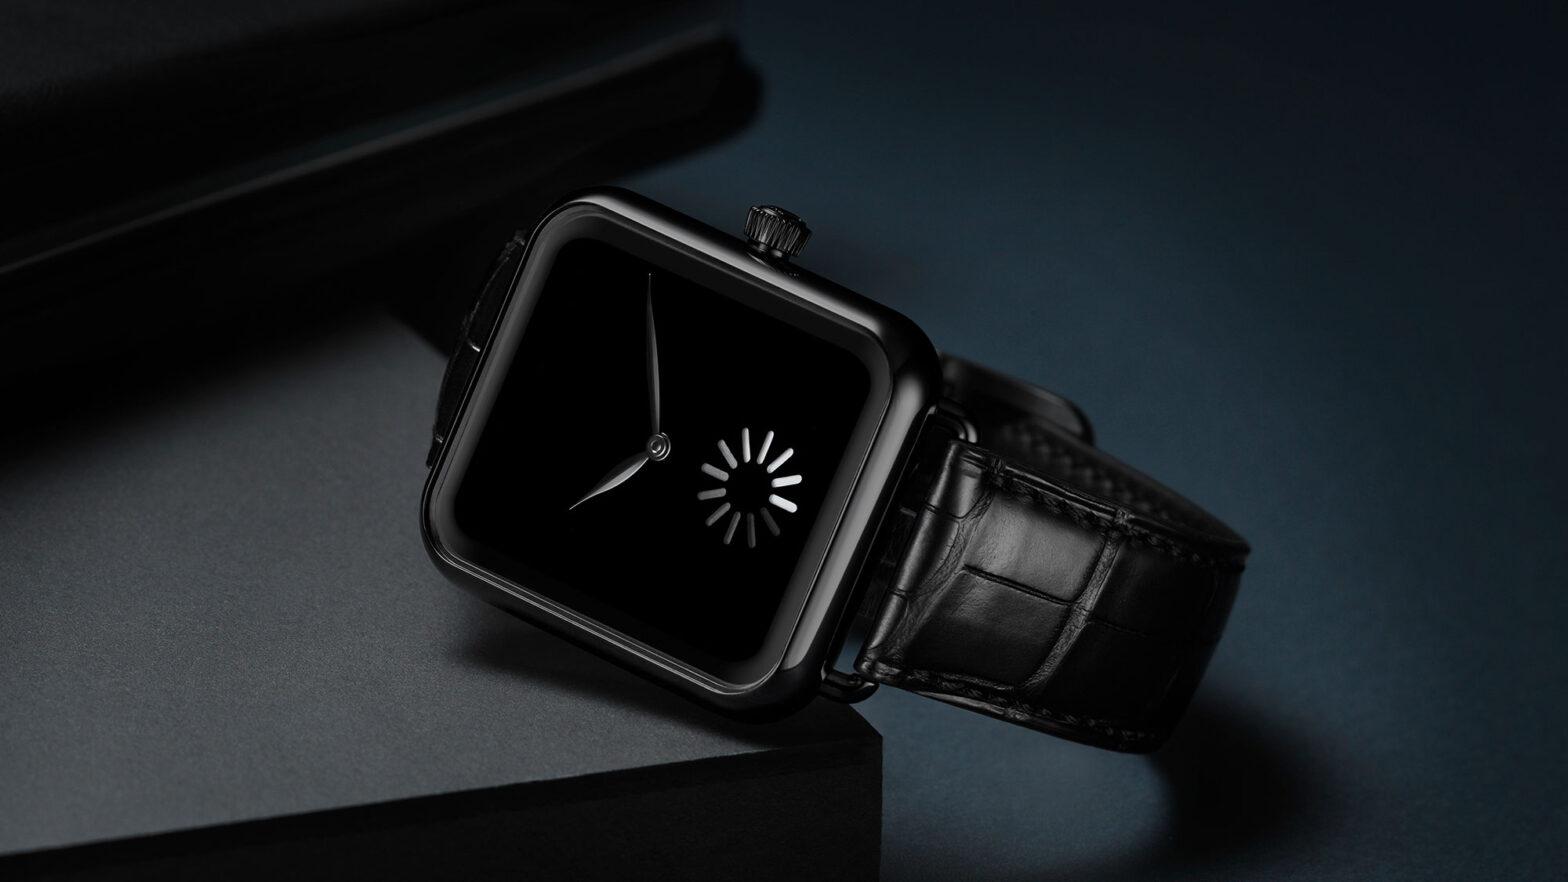 Swiss Alp Watch Final Upgrade Luxury Watch